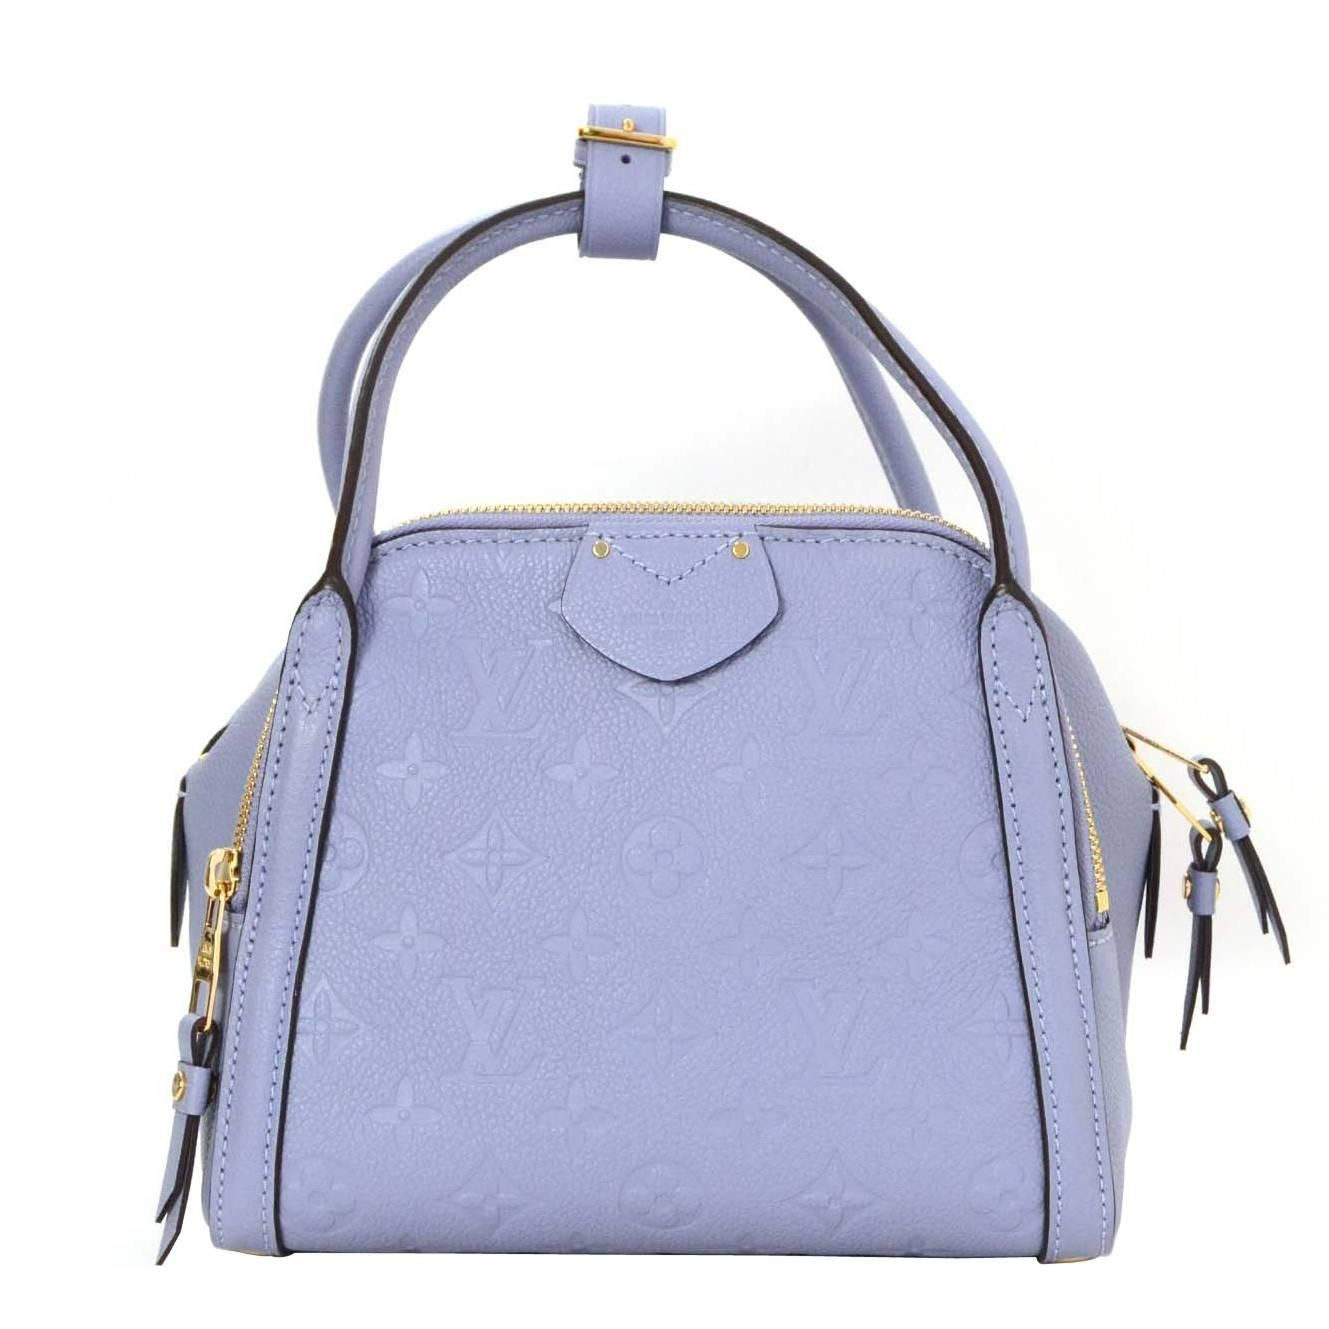 969e67c4186f Louis Vuitton Lilas Periwinkle Empreinte Marais BB Bag